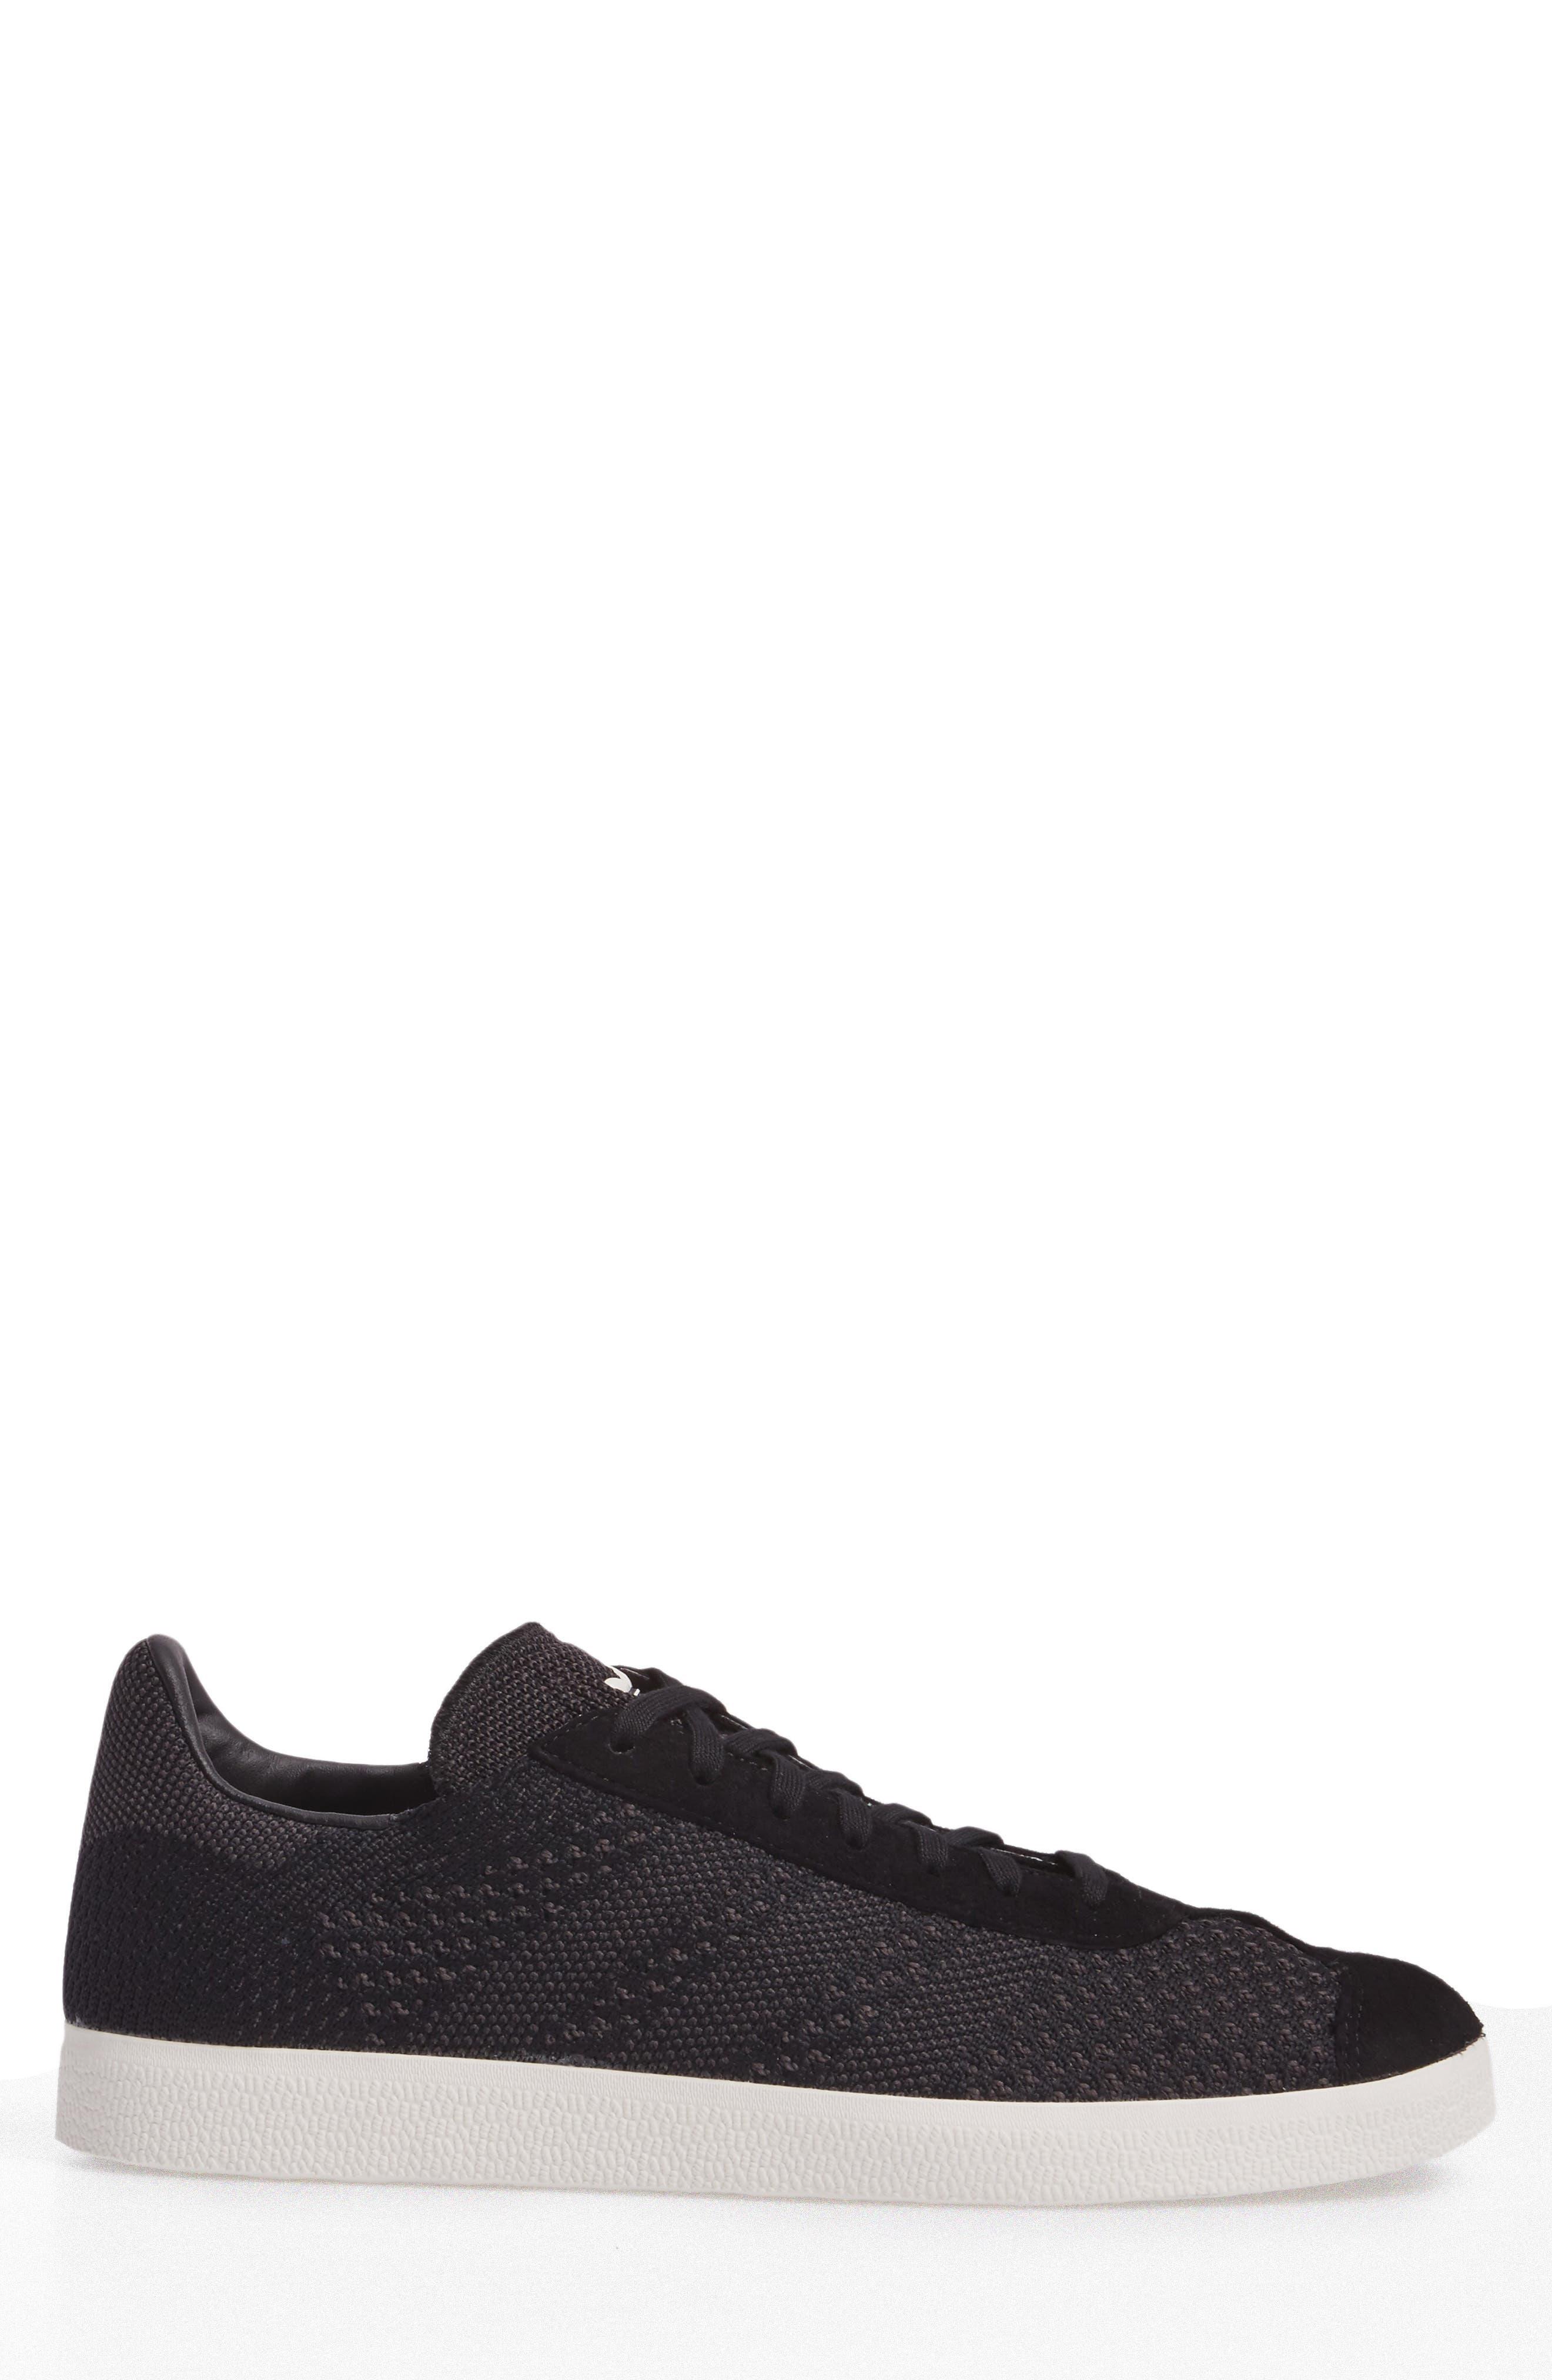 Gazelle Primeknit Sneaker,                             Alternate thumbnail 3, color,                             Core Black/ Off White